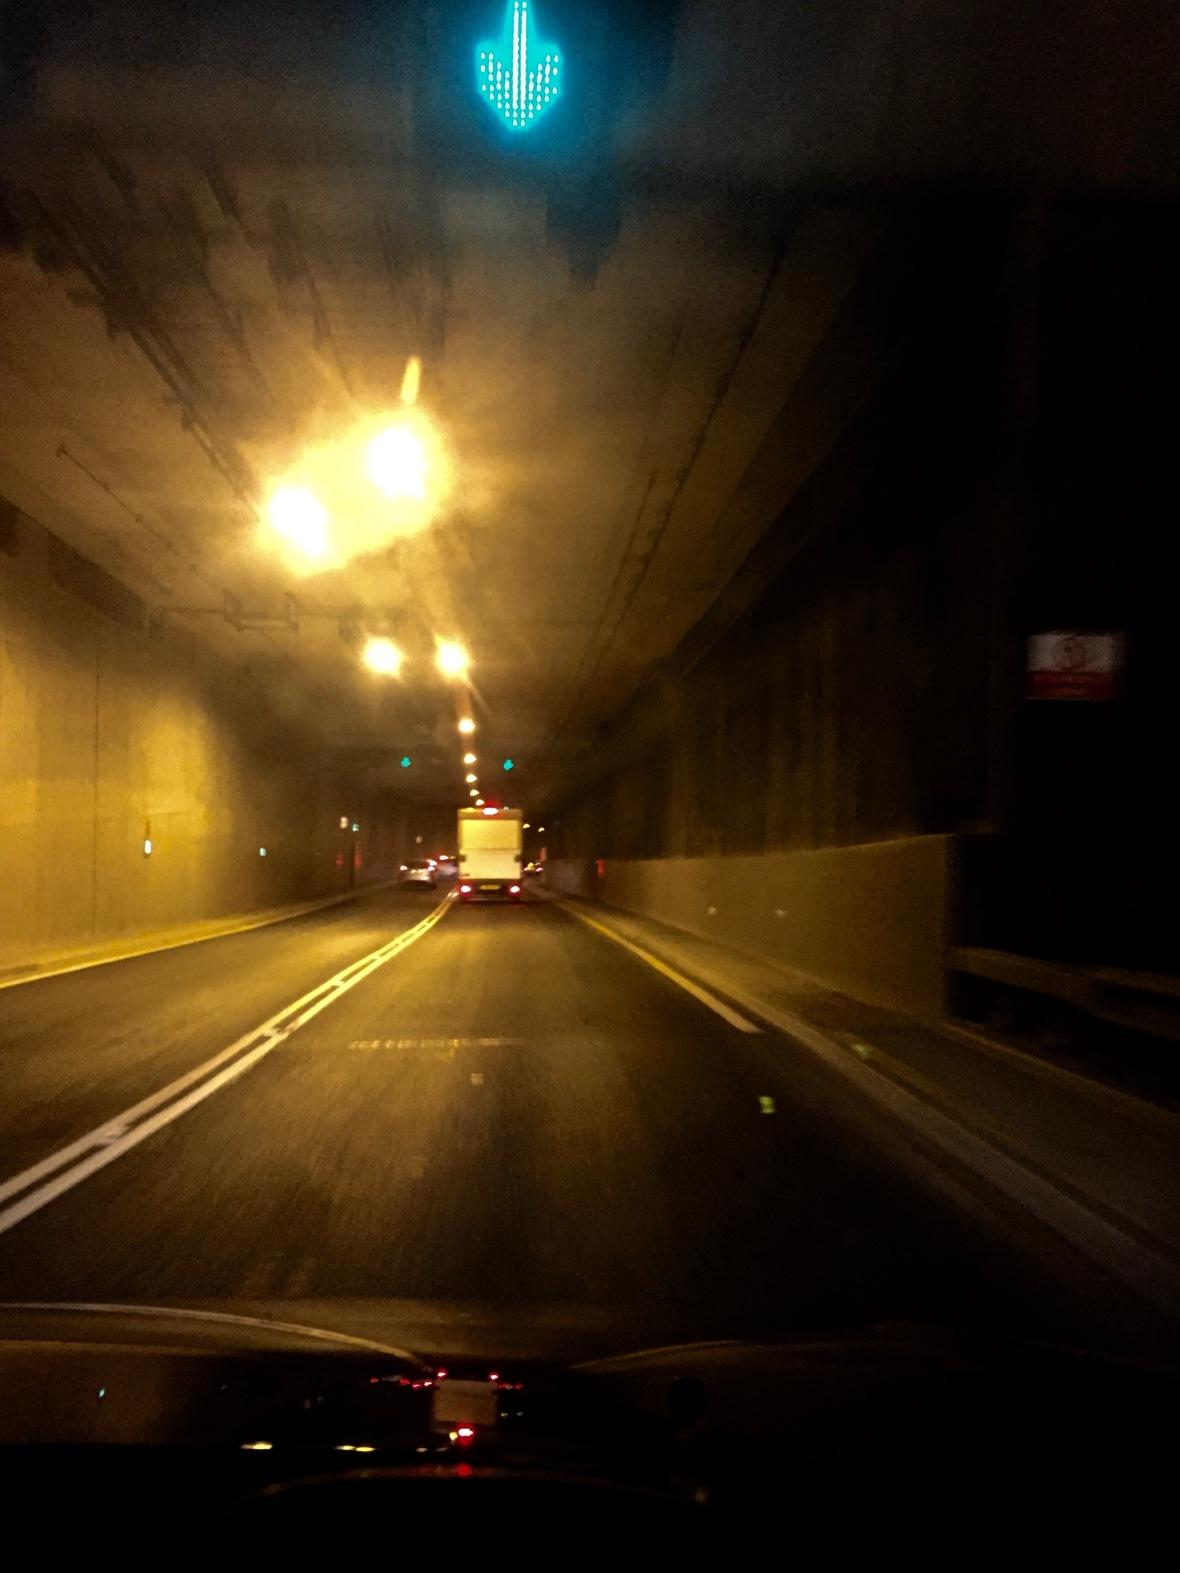 Through the Tyne Tunnel